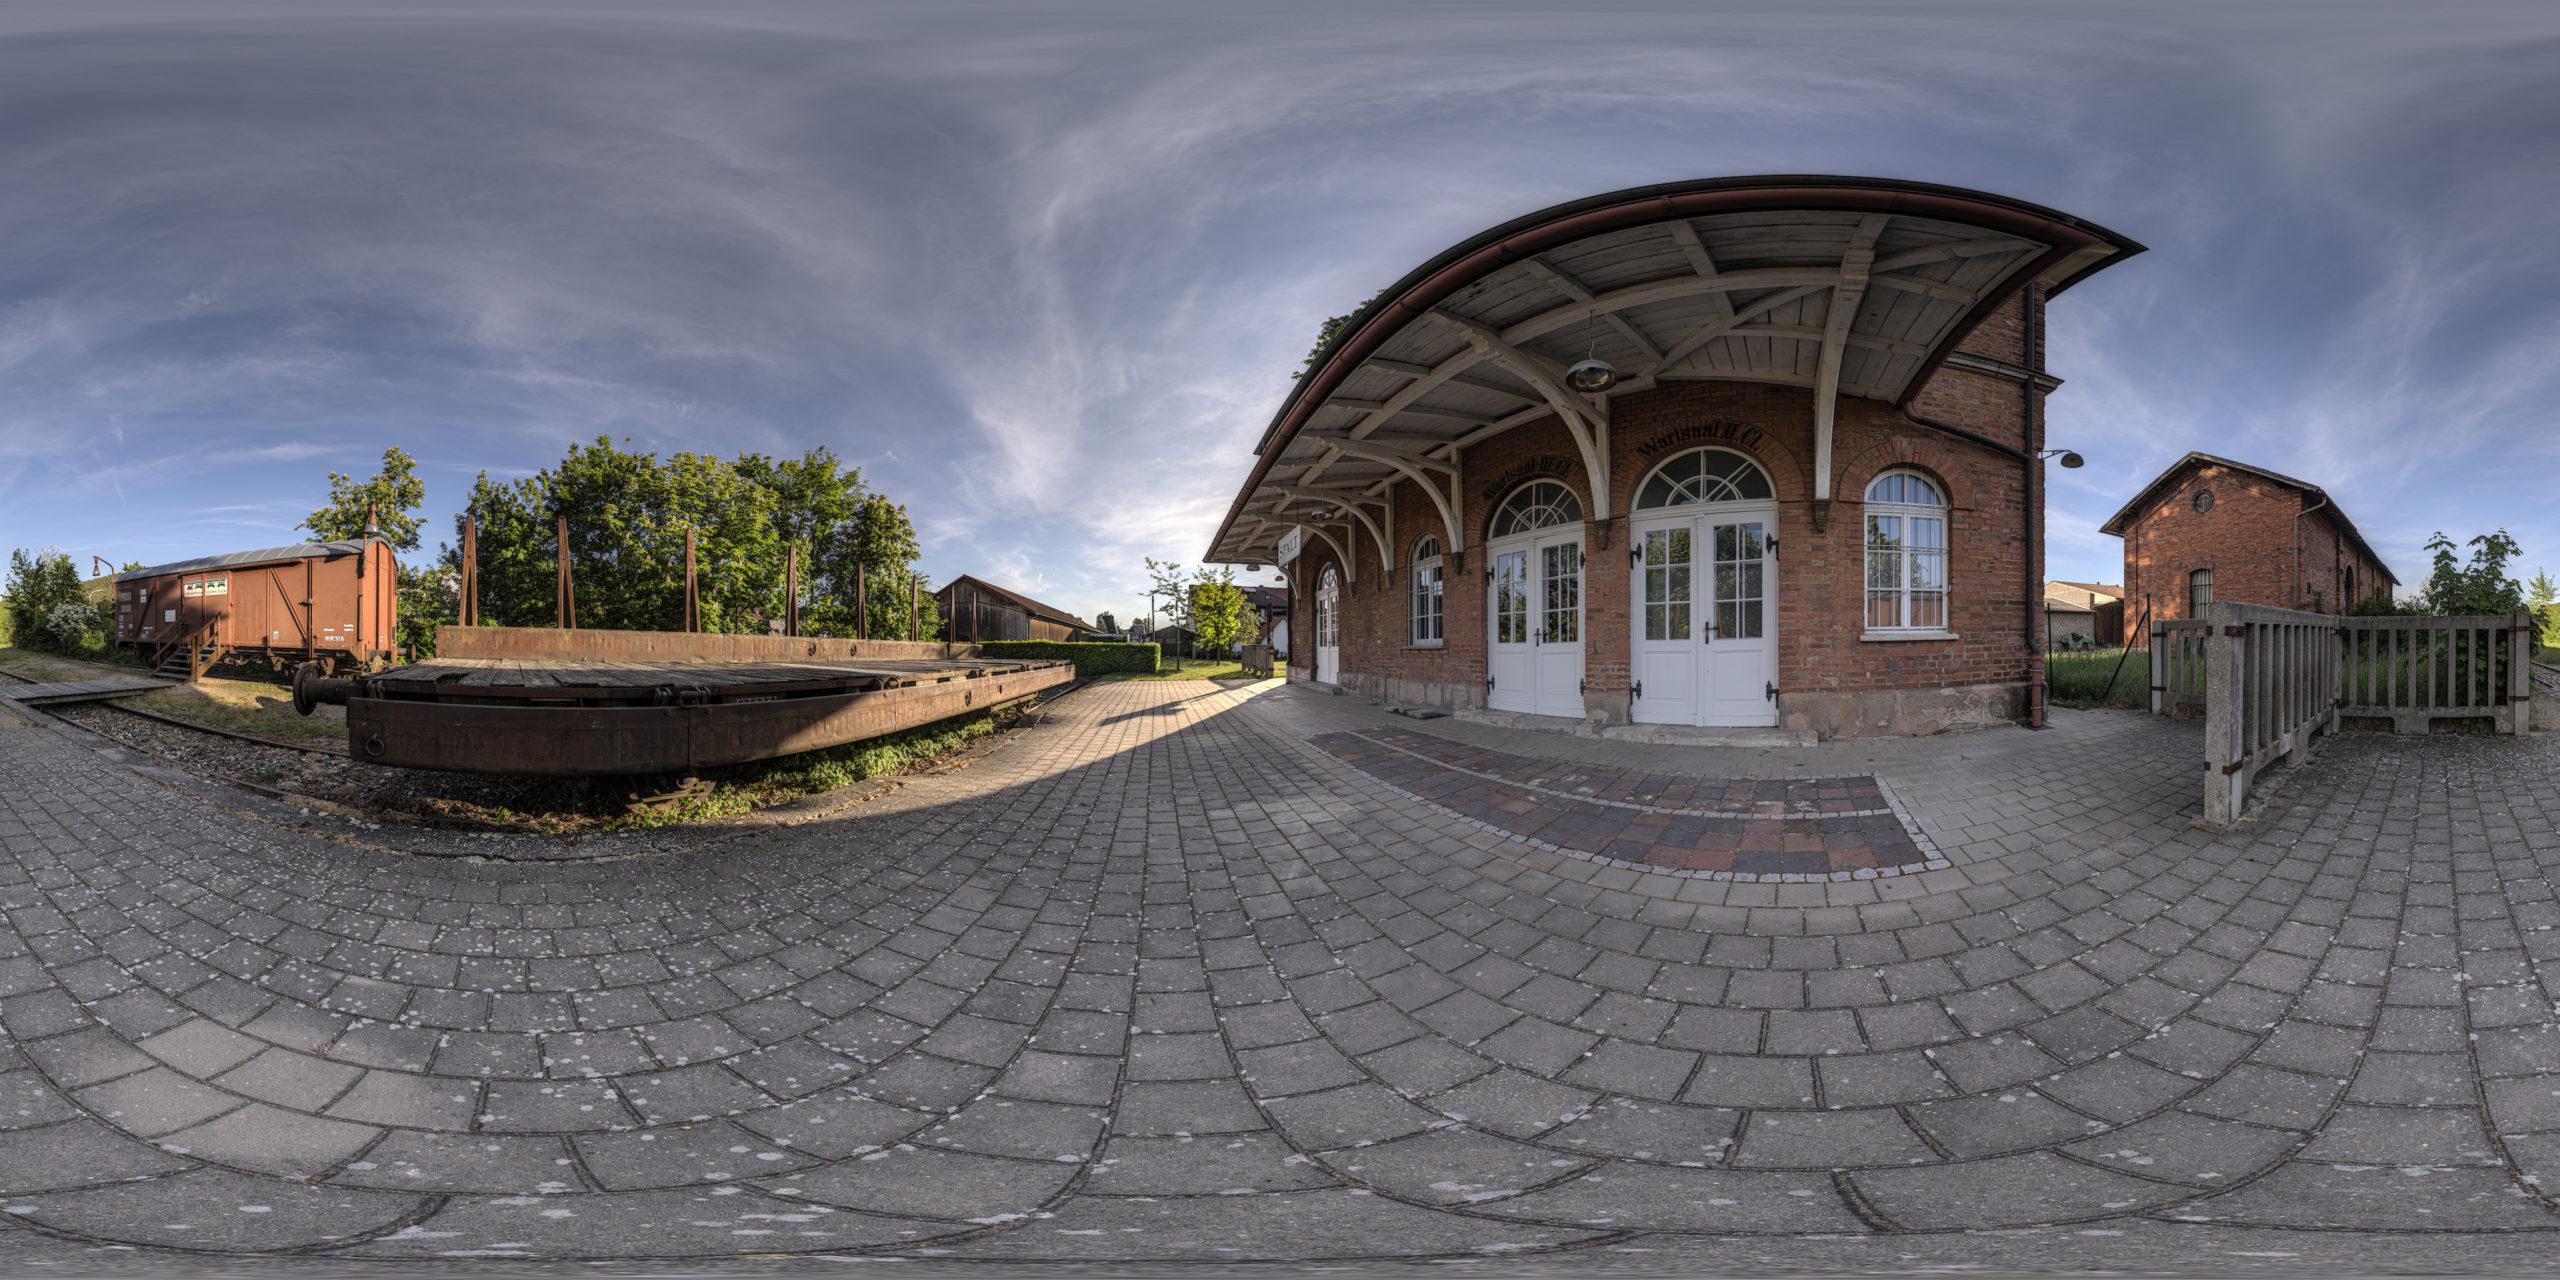 HDRI-Skies-Old-Train-Station-Spalt